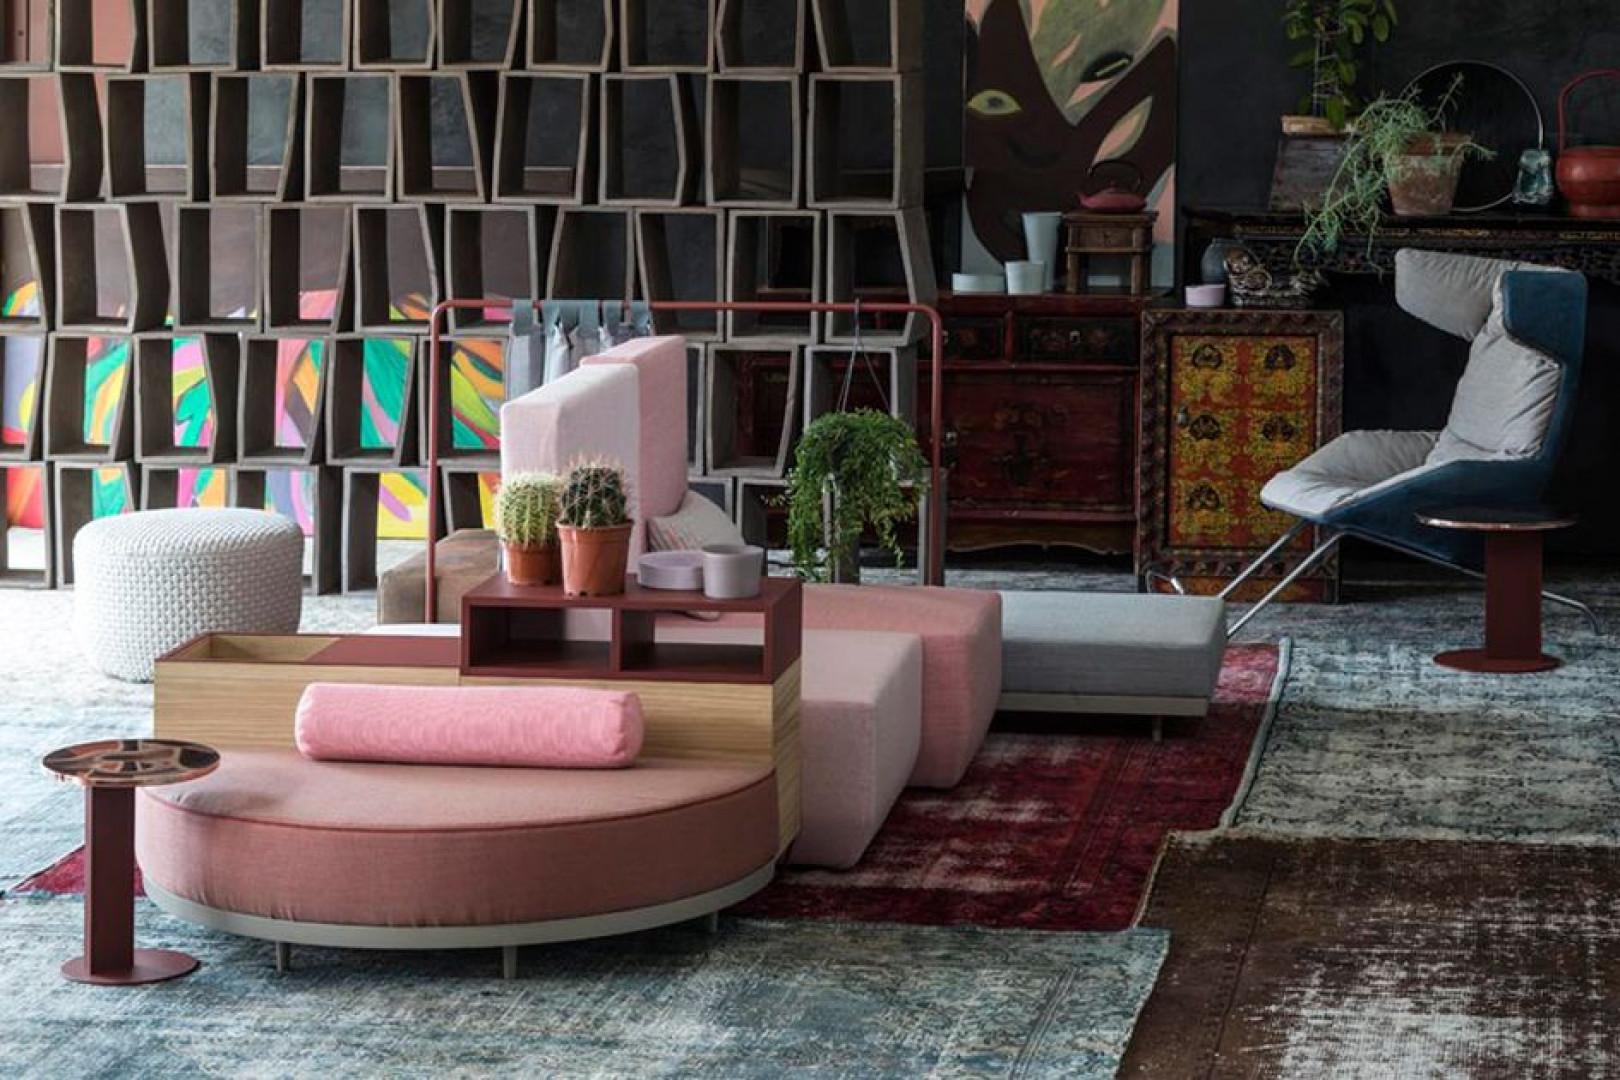 Sofa z serii Bikini Island firmy Moroso. Projekt: Werner Aisslinger. Fot. Moroso